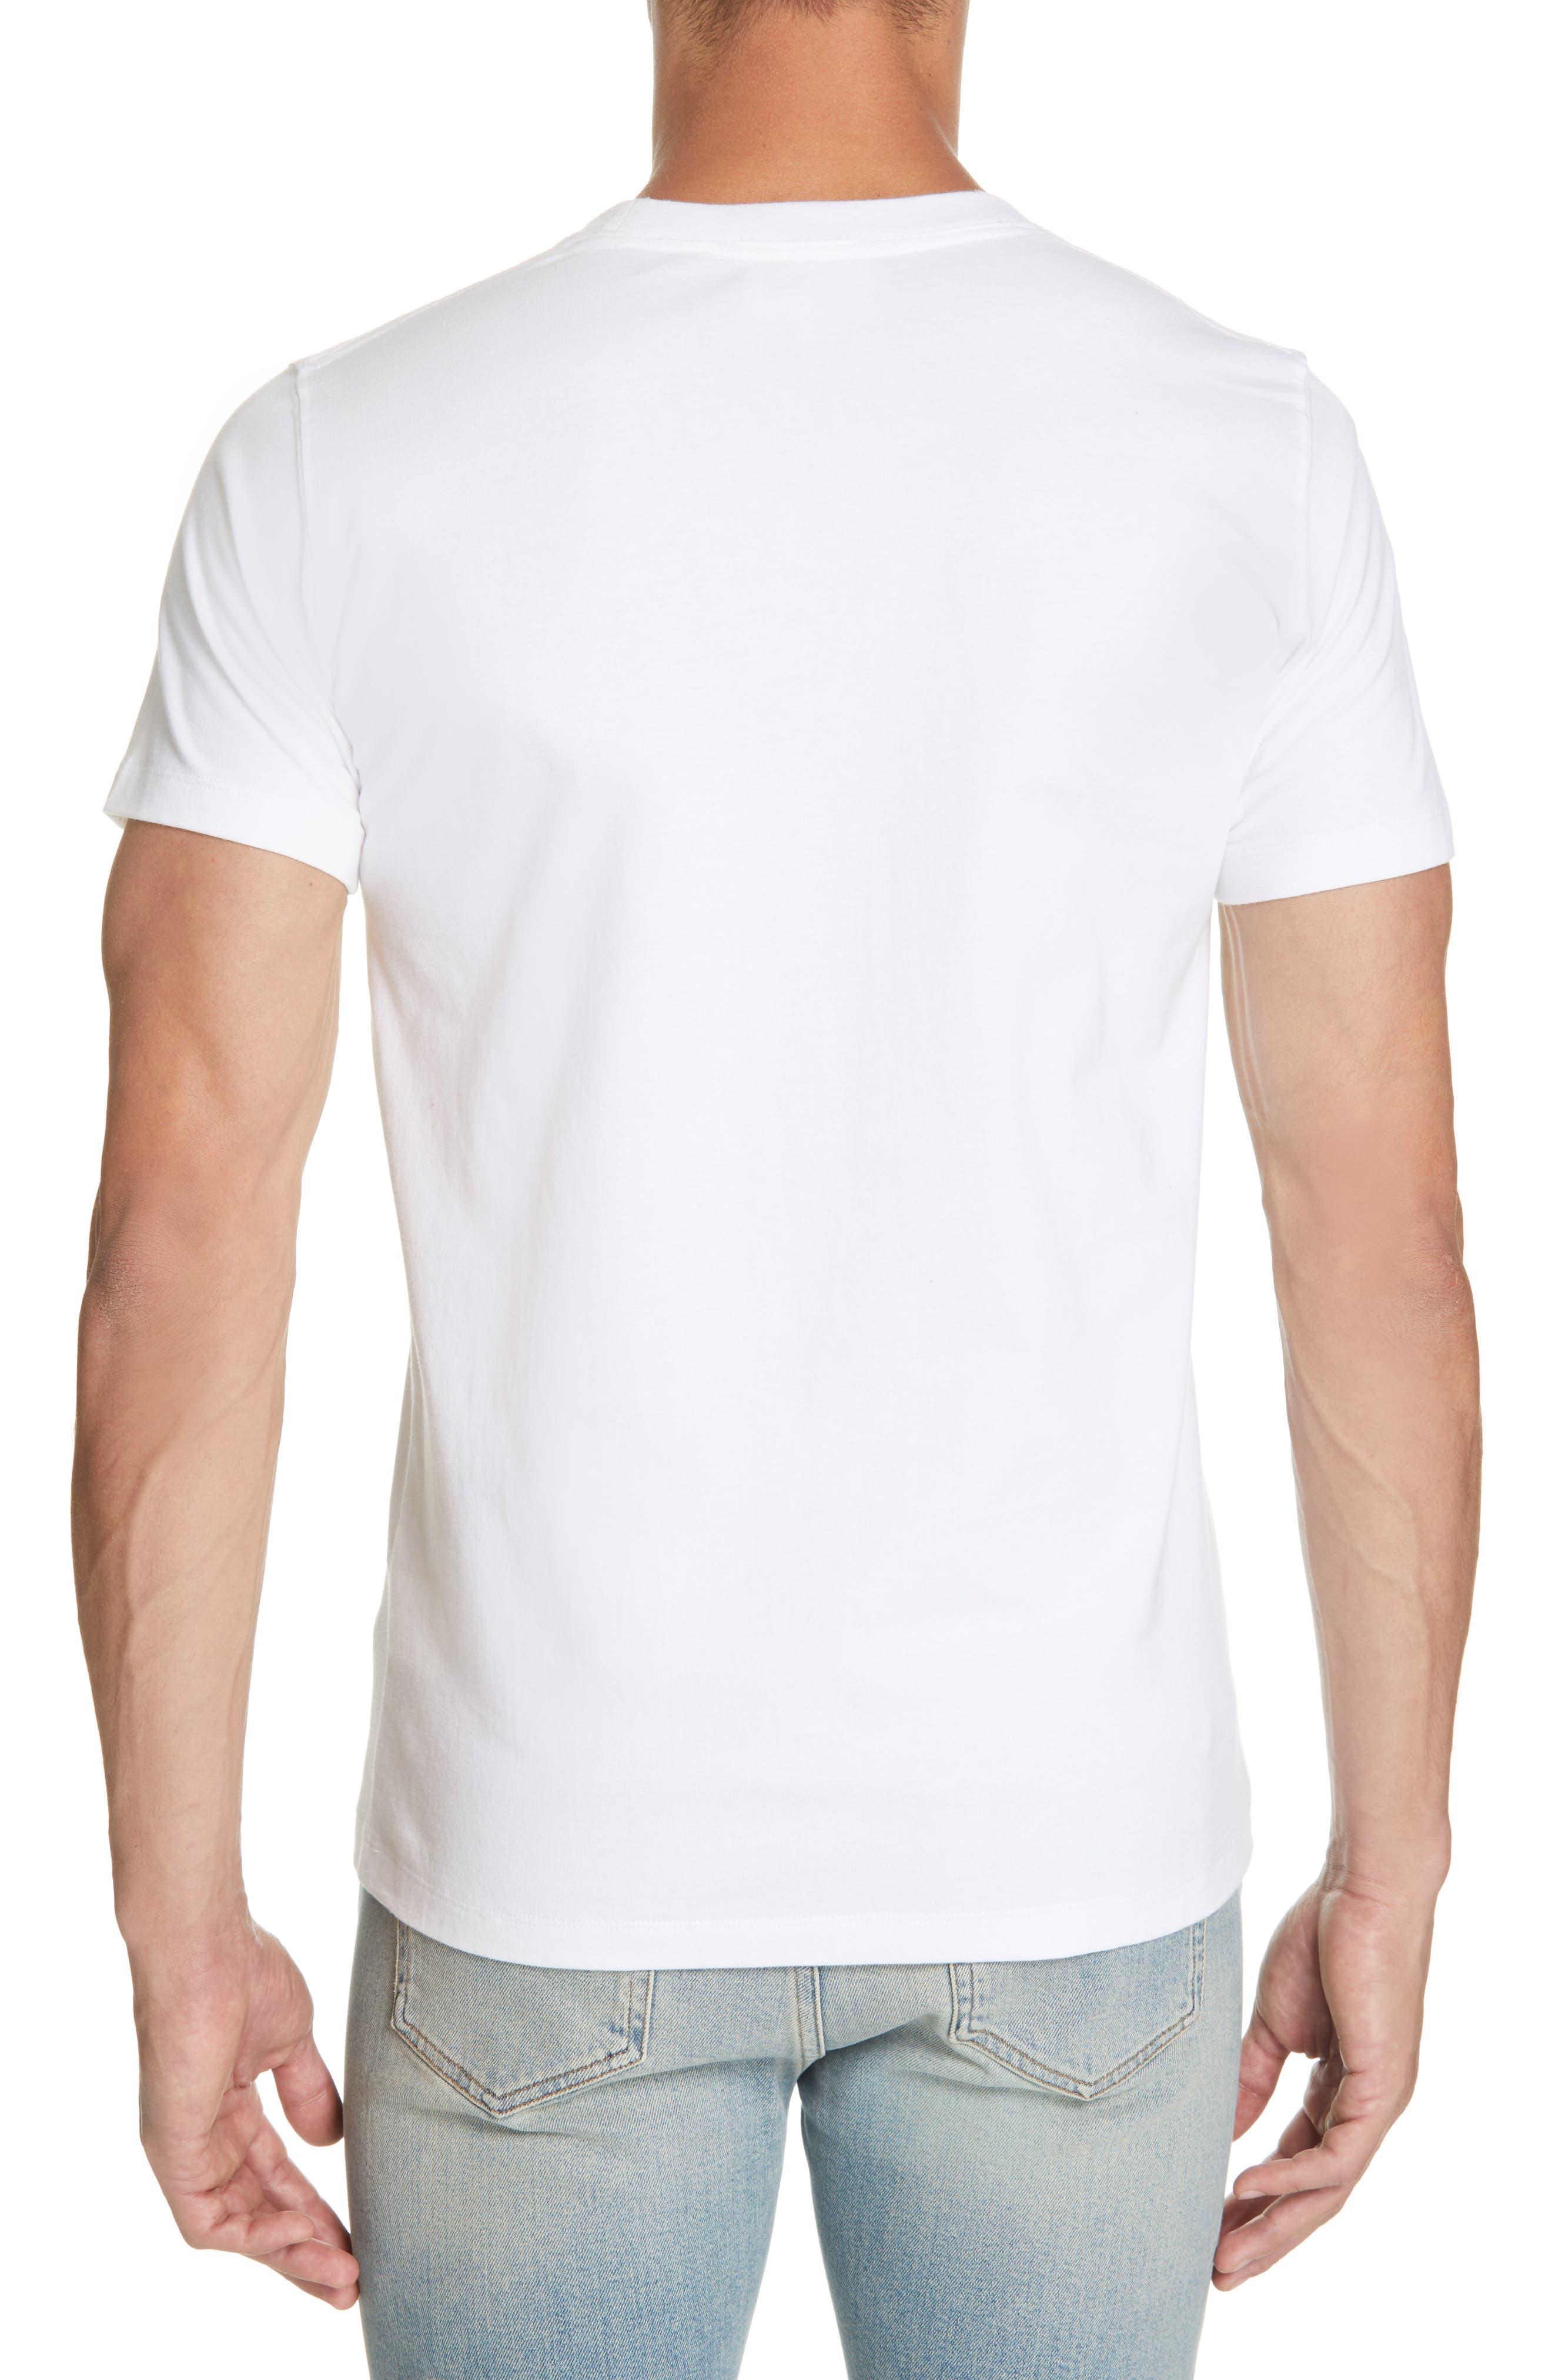 Daniel Frost - Hanging Graphic T-Shirt,                             Alternate thumbnail 2, color,                             WHITE